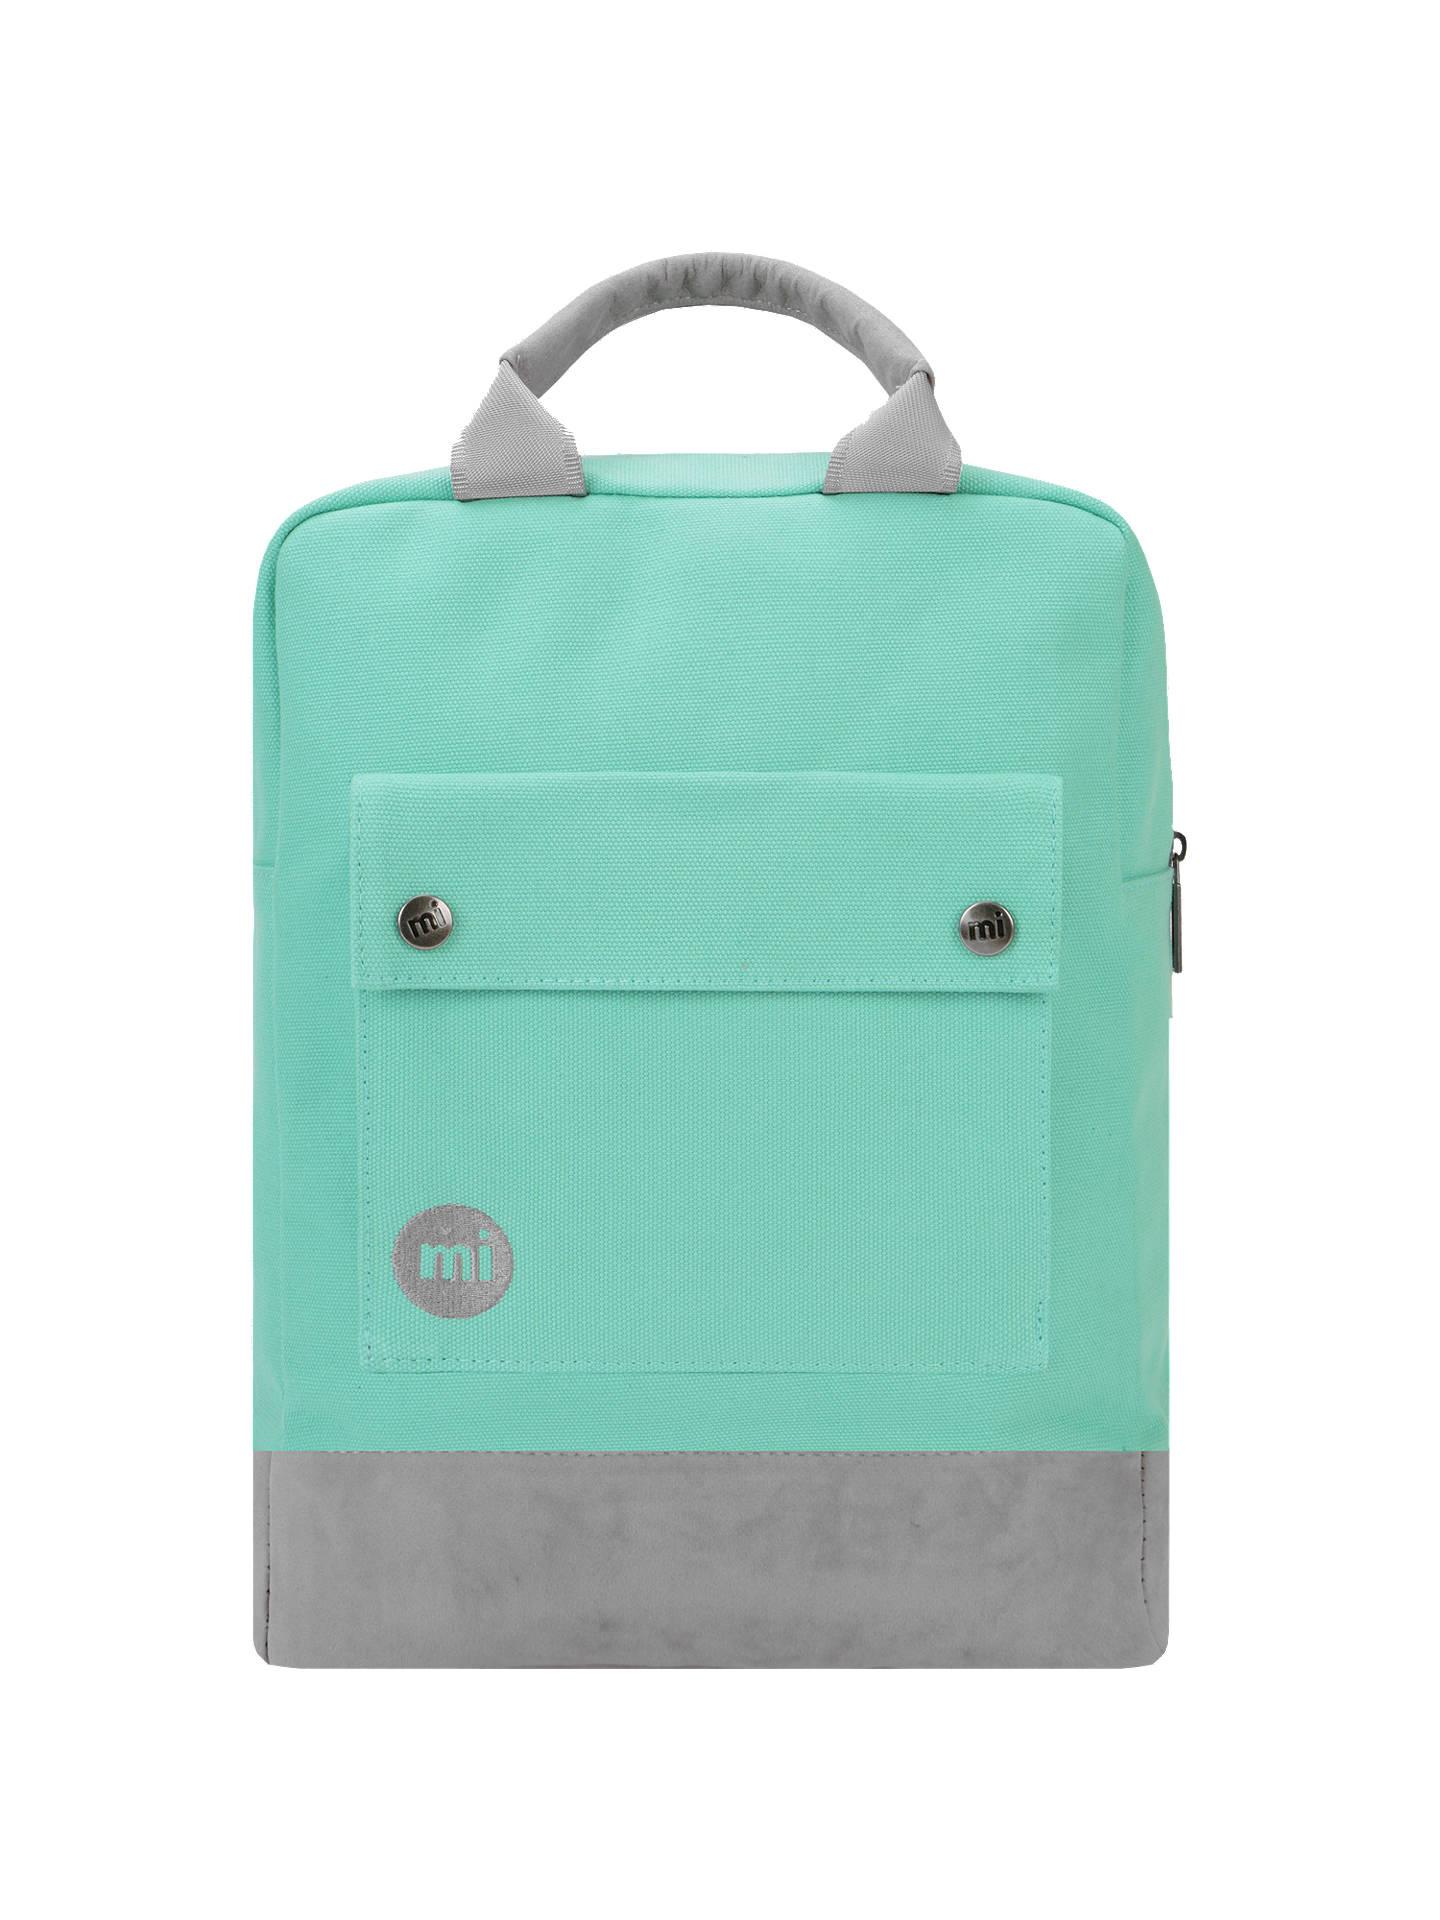 76c890cadde Buy Mi-Pac Canvas Tote Backpack, Mint Online at johnlewis.com ...